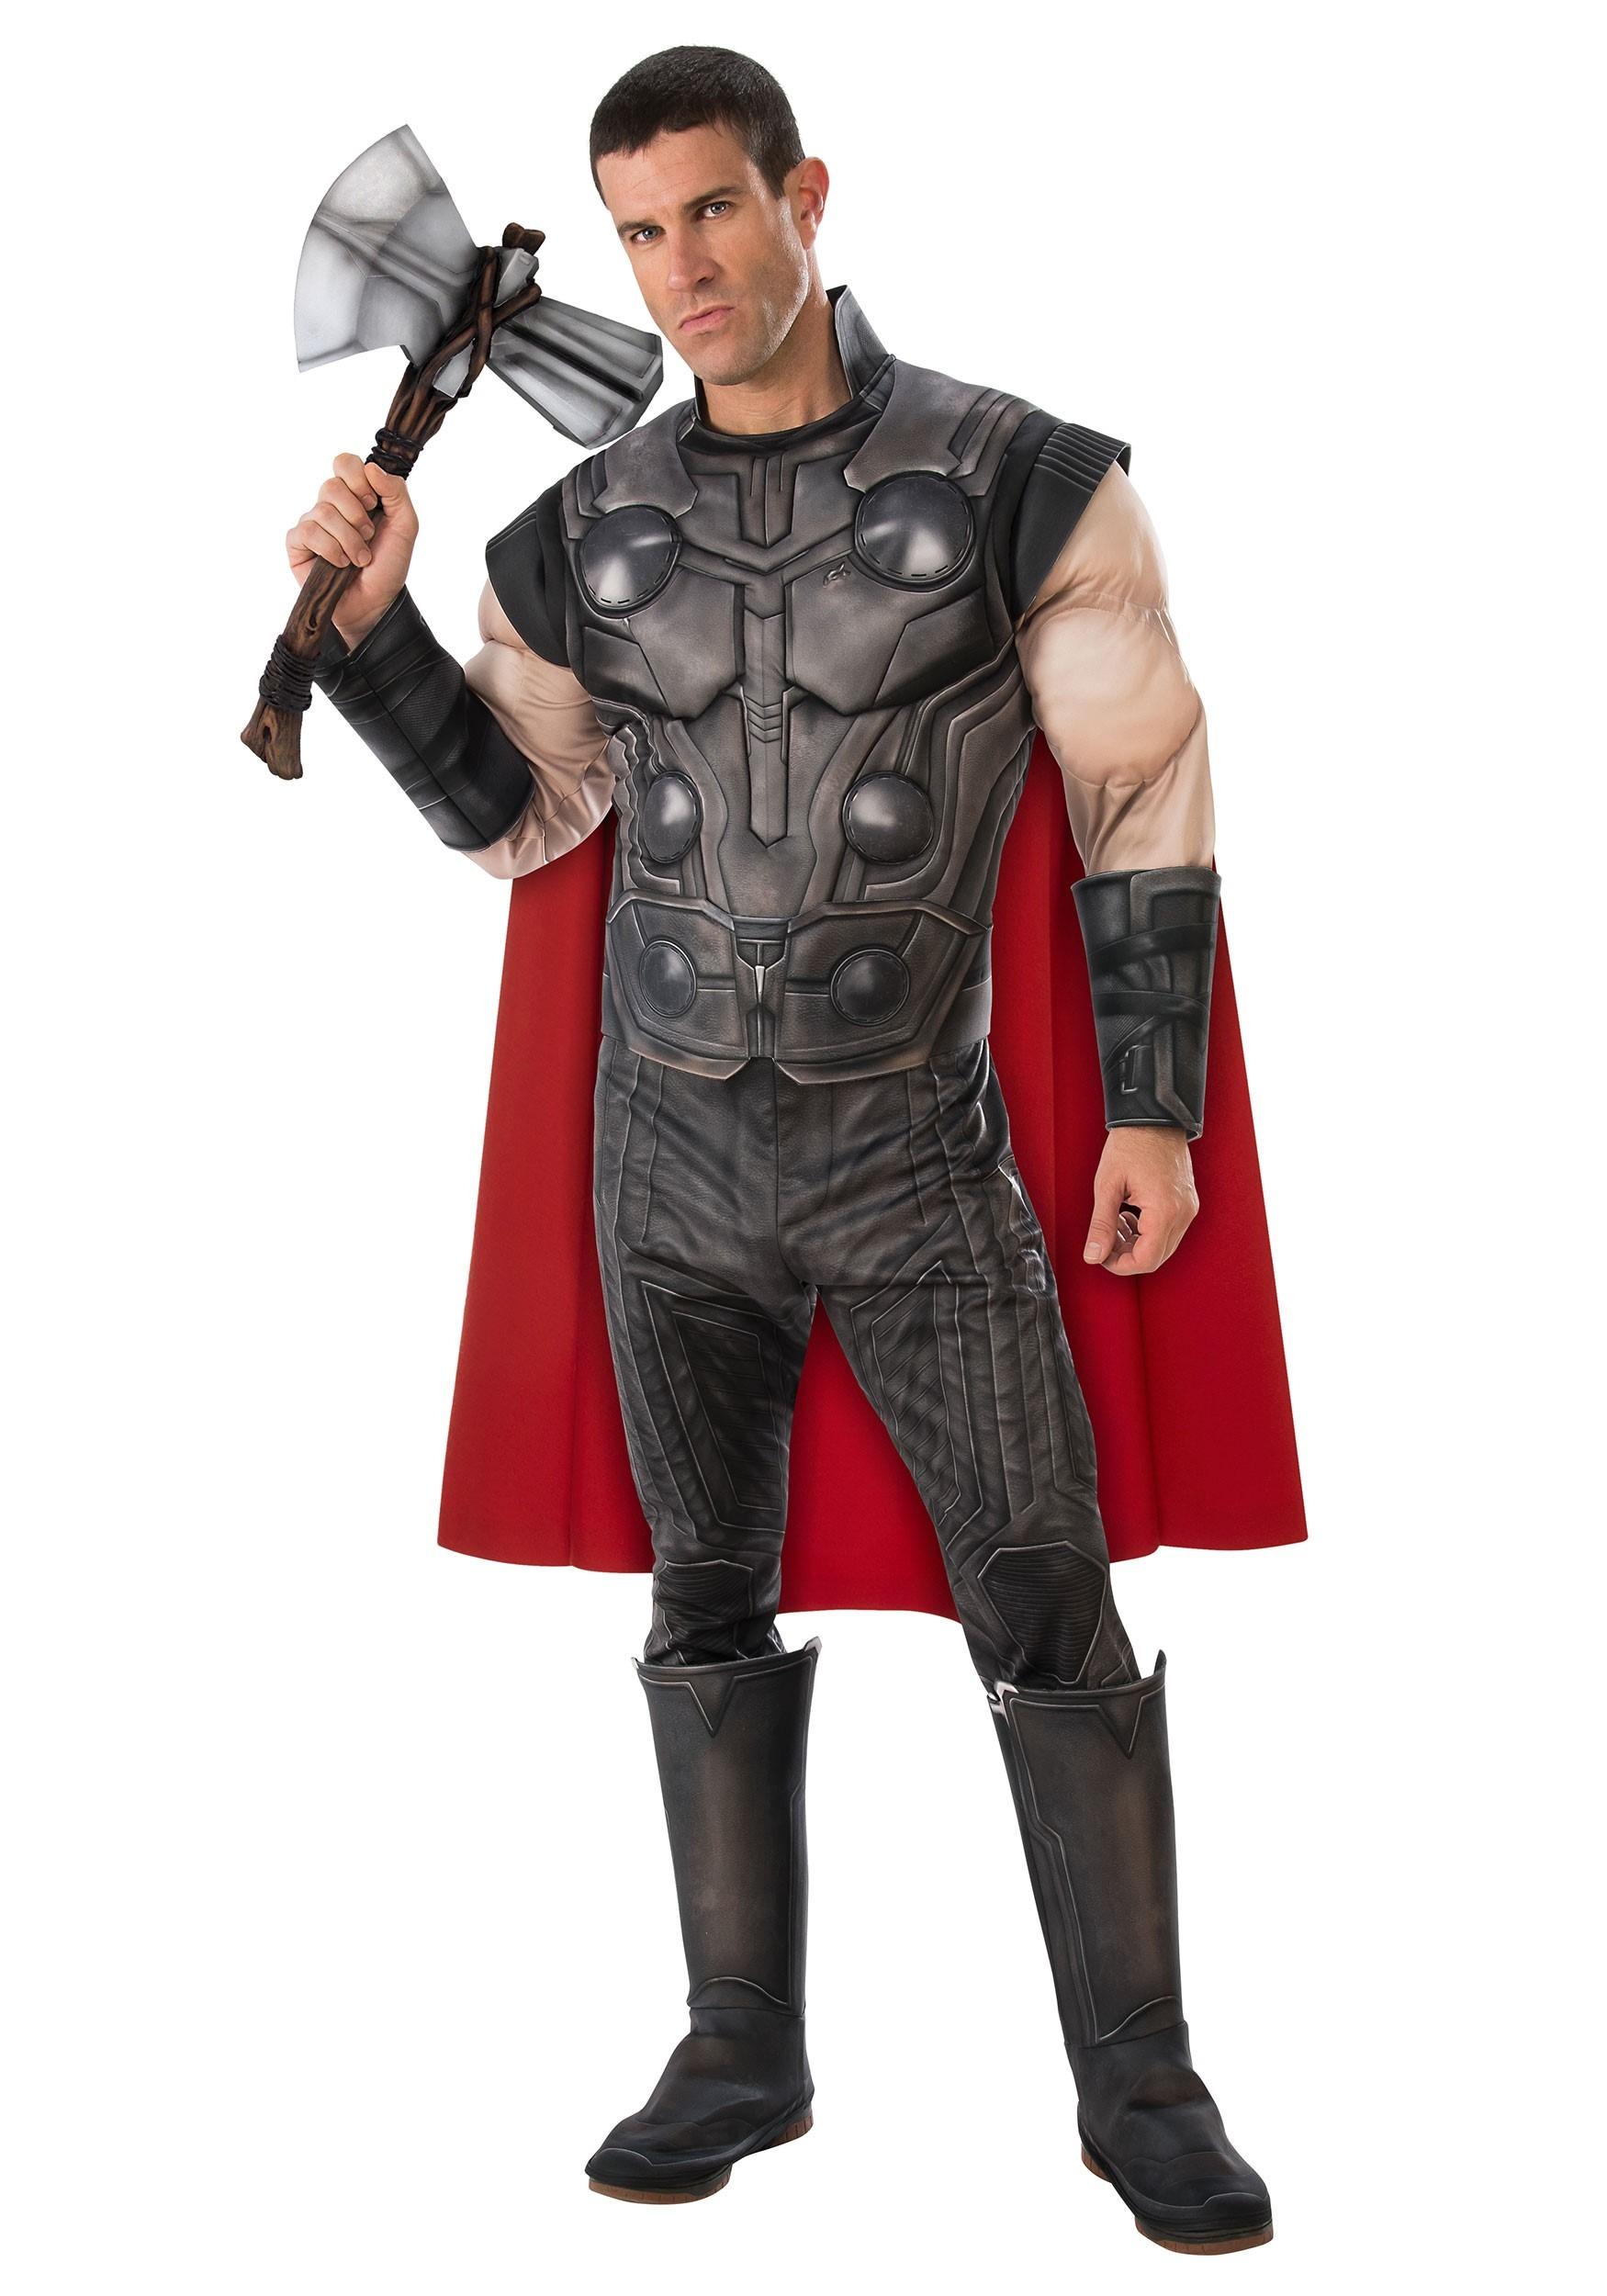 Adult Avengers Endgame Deluxe Thor Costume